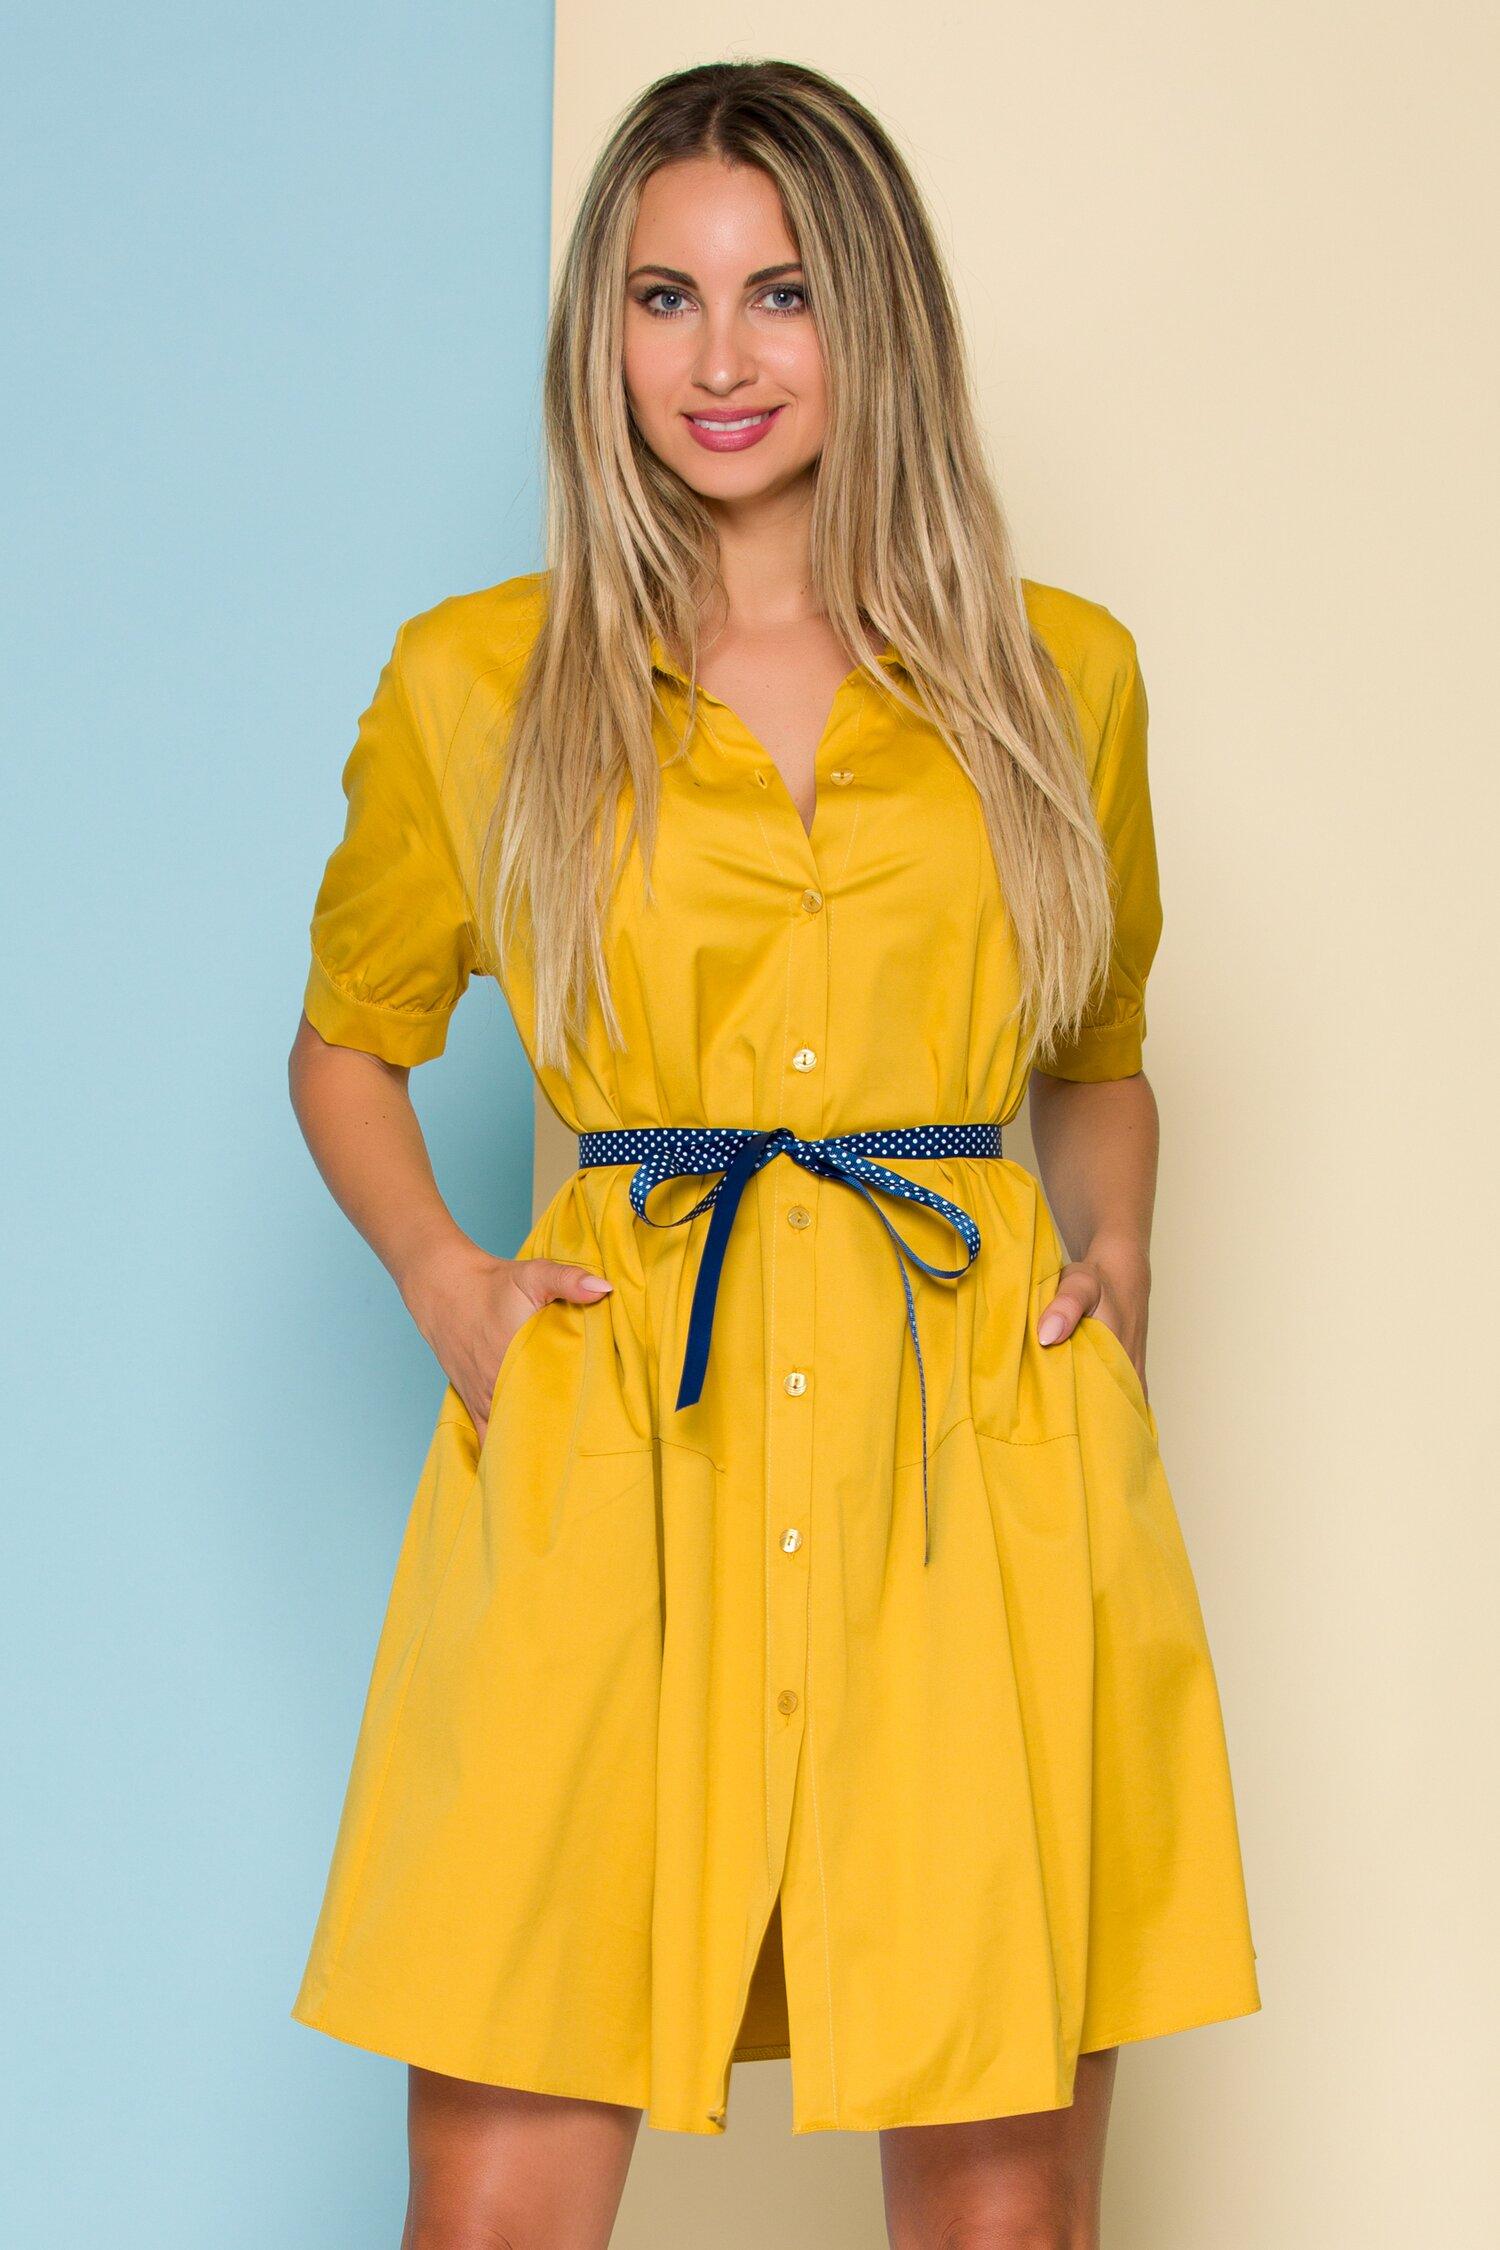 Rochie Ruxy galben mustar tip camasa cu cordon in talie